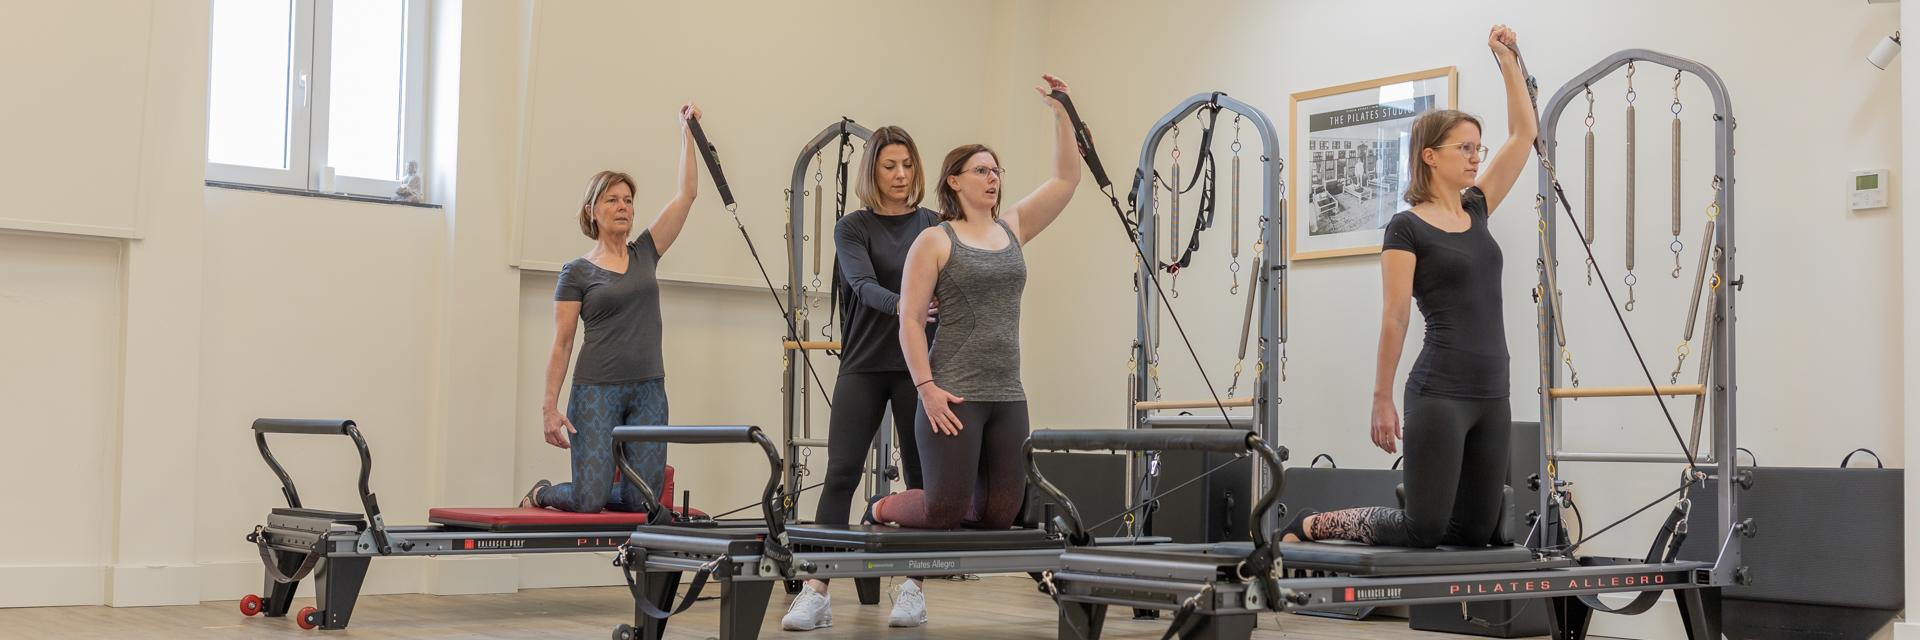 Pilates reformer groepslessen - Inna Gulak - inna Gulak Pilates - Pilates venlo - Pilates groepslessen - Personal Training - Pilates Reformer - Pilates Mat - Venlo - 04